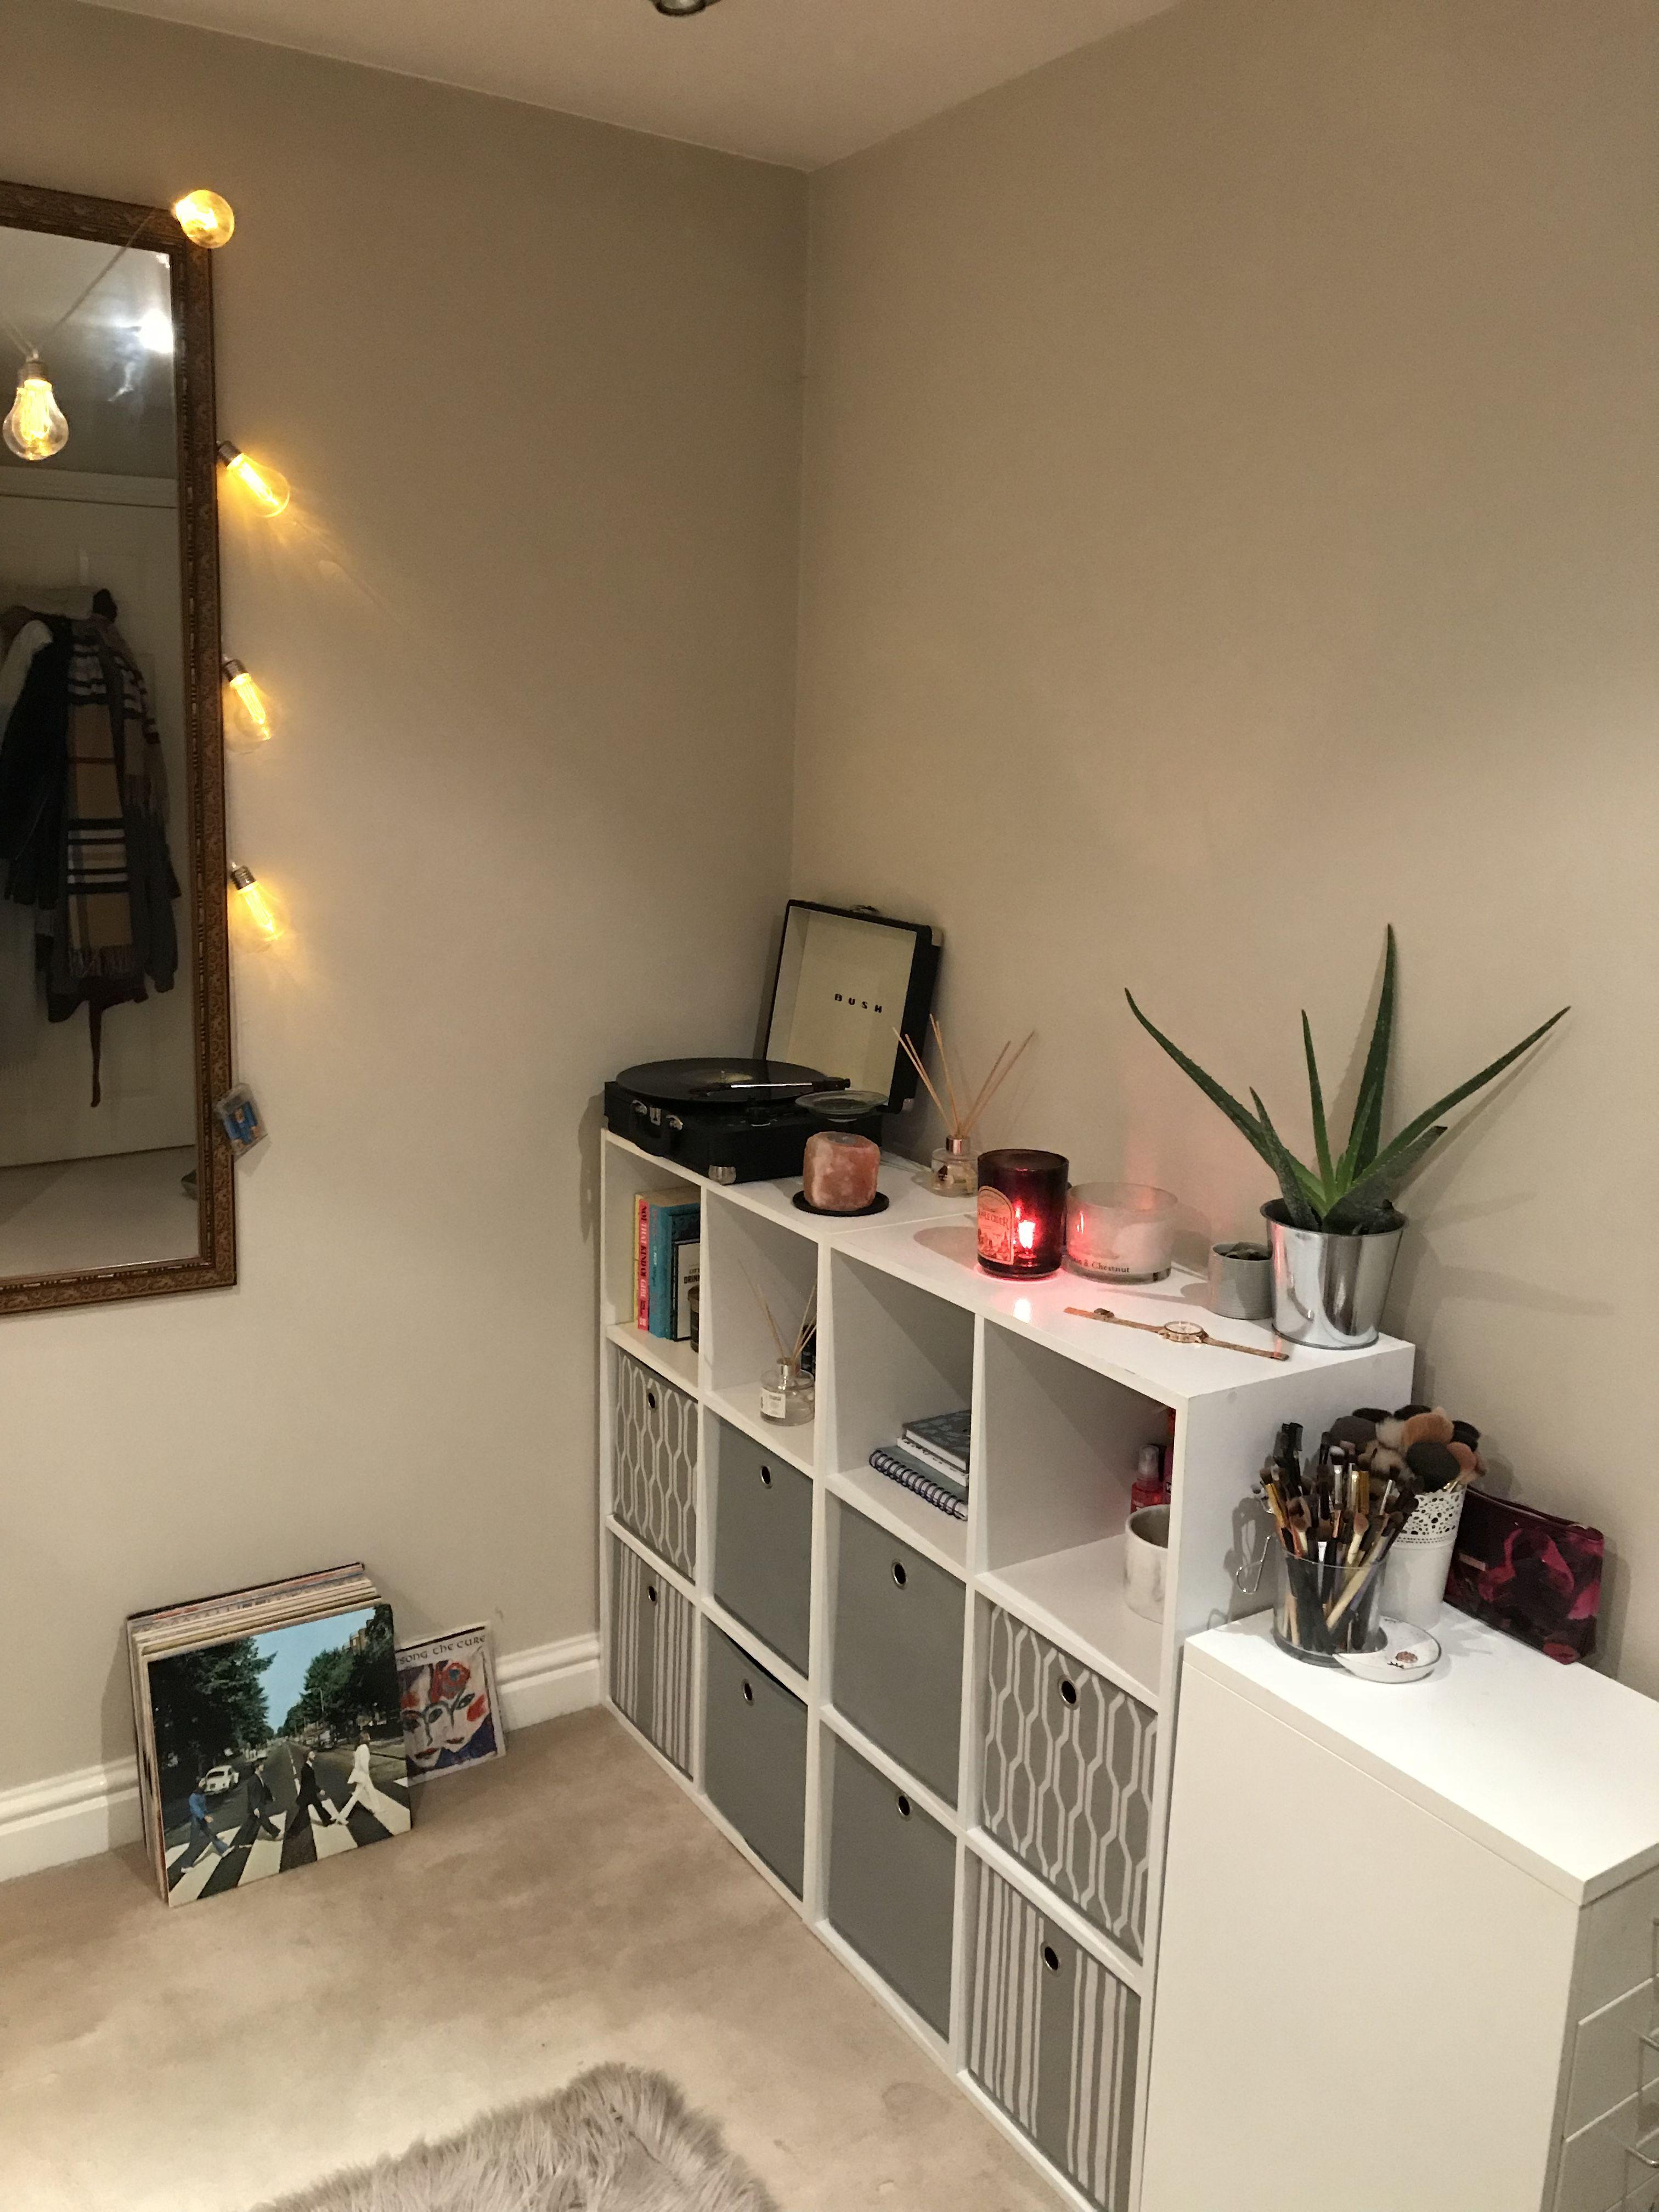 Bedroom Overhaul Record Player And Storage Units Diy Bedroom